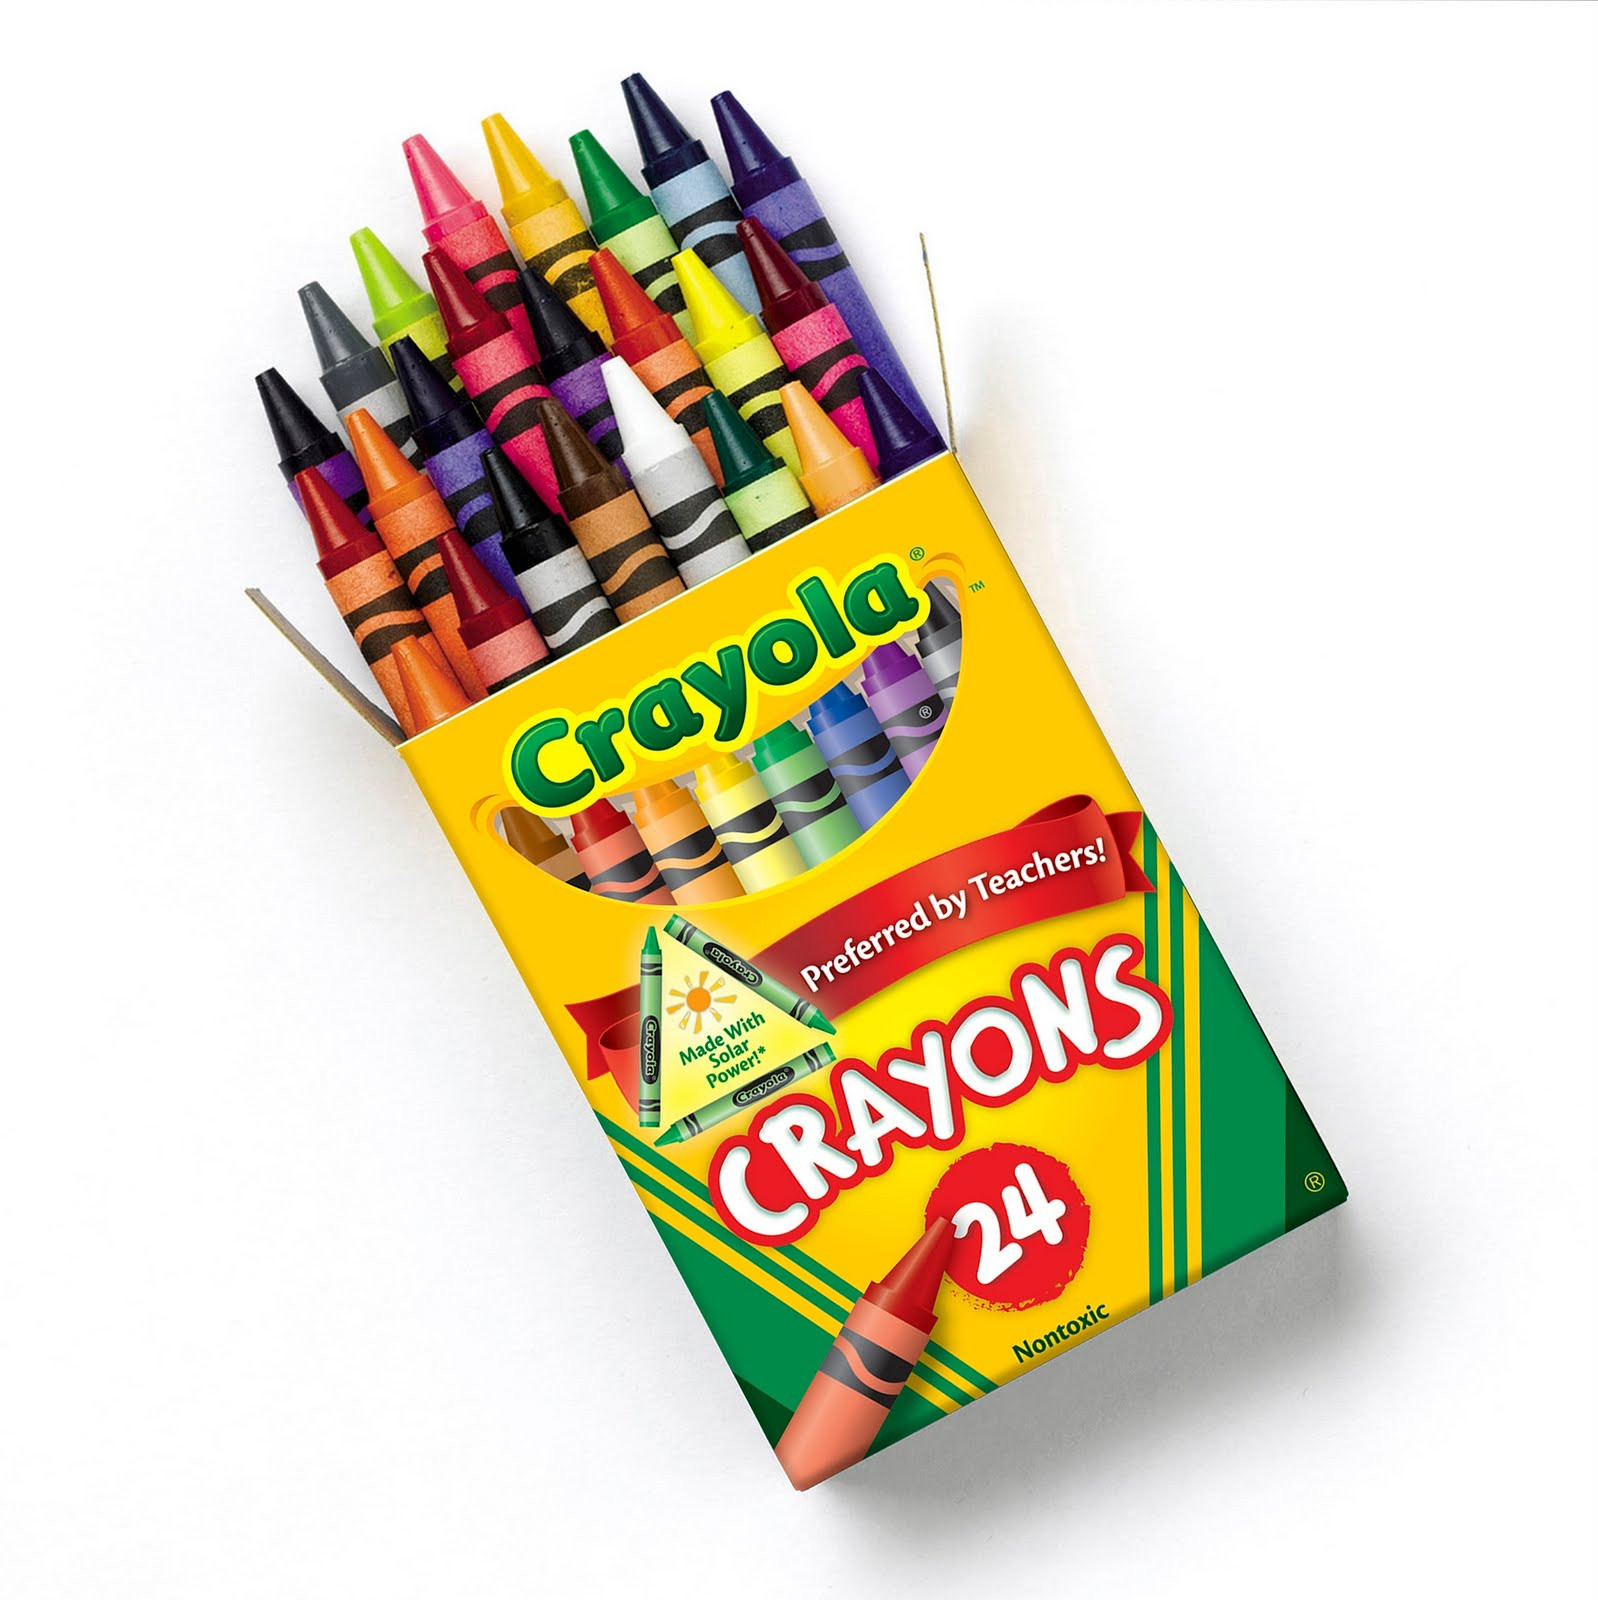 1598x1600 Crayola Colored Pencil Clipart Ltkepbjta Bright